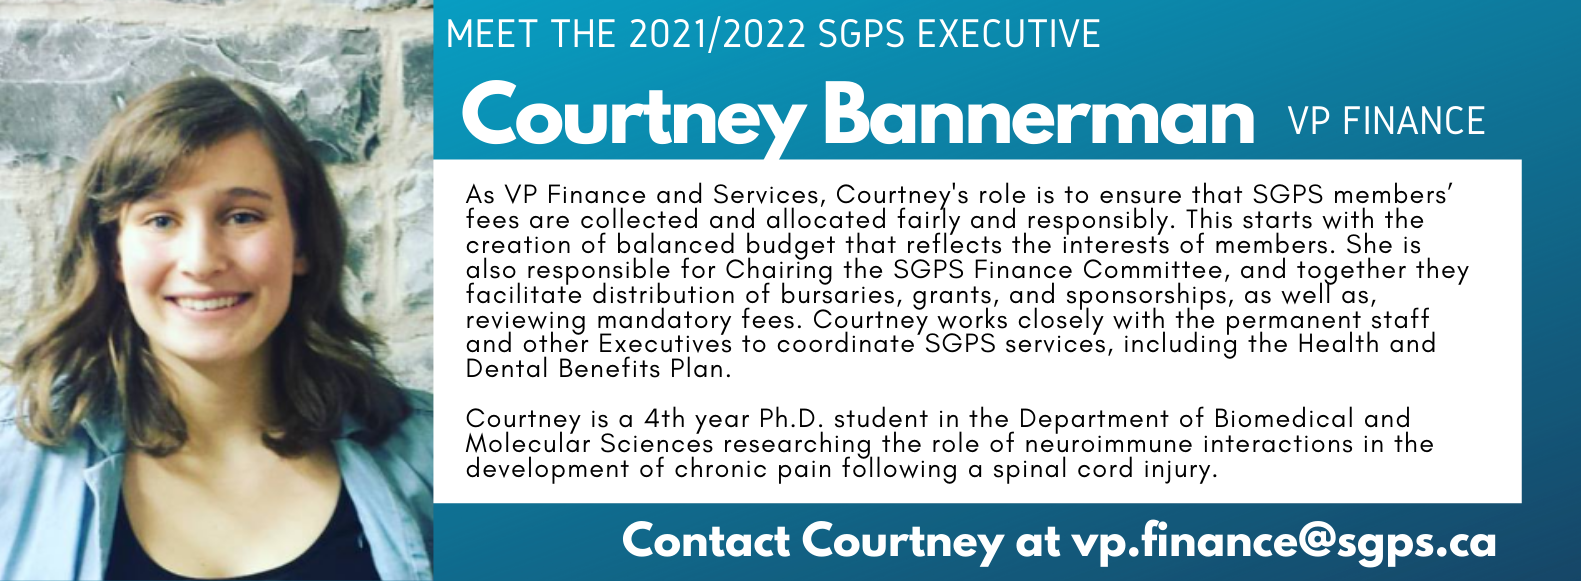 Courtney Bannerman, SGPS Vice President Finance. Contact Courtney vp.finance@sgps.ca